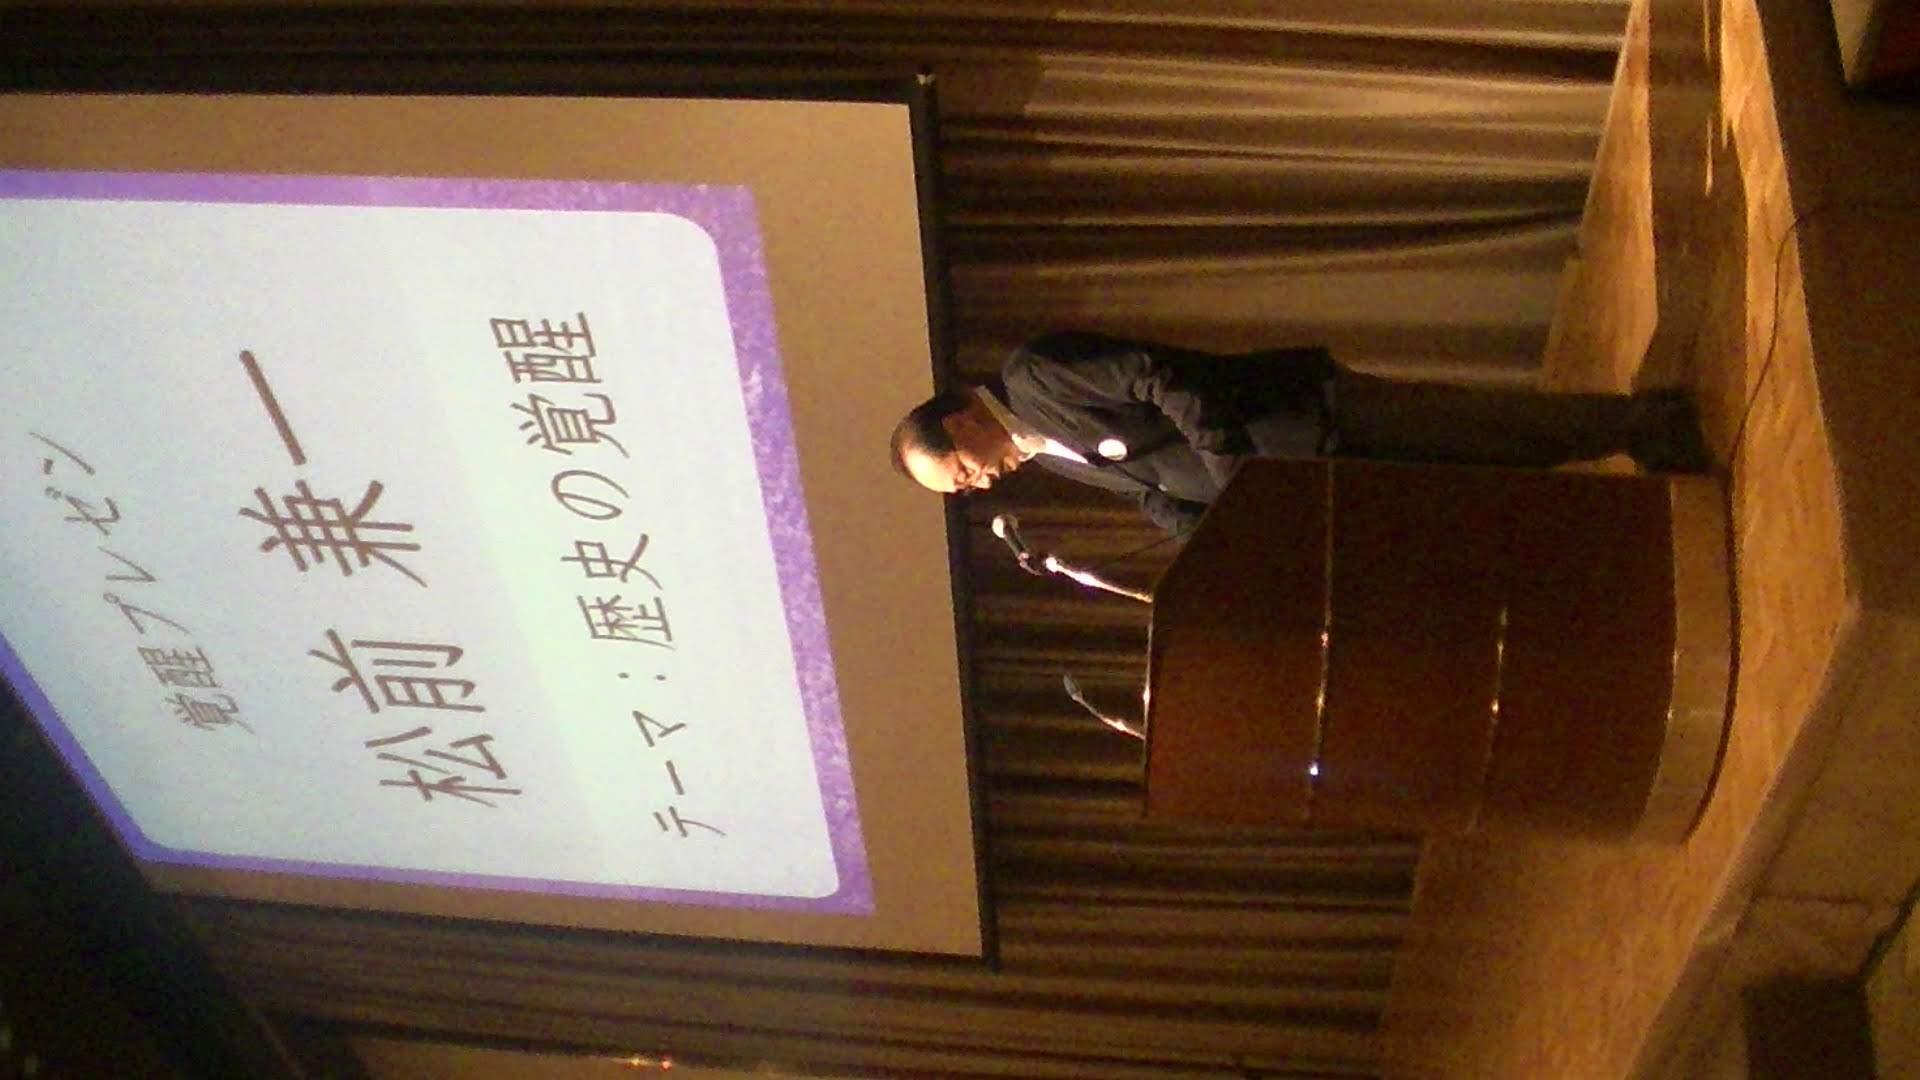 PIC 1778 1 - 思風会全国大会in広島